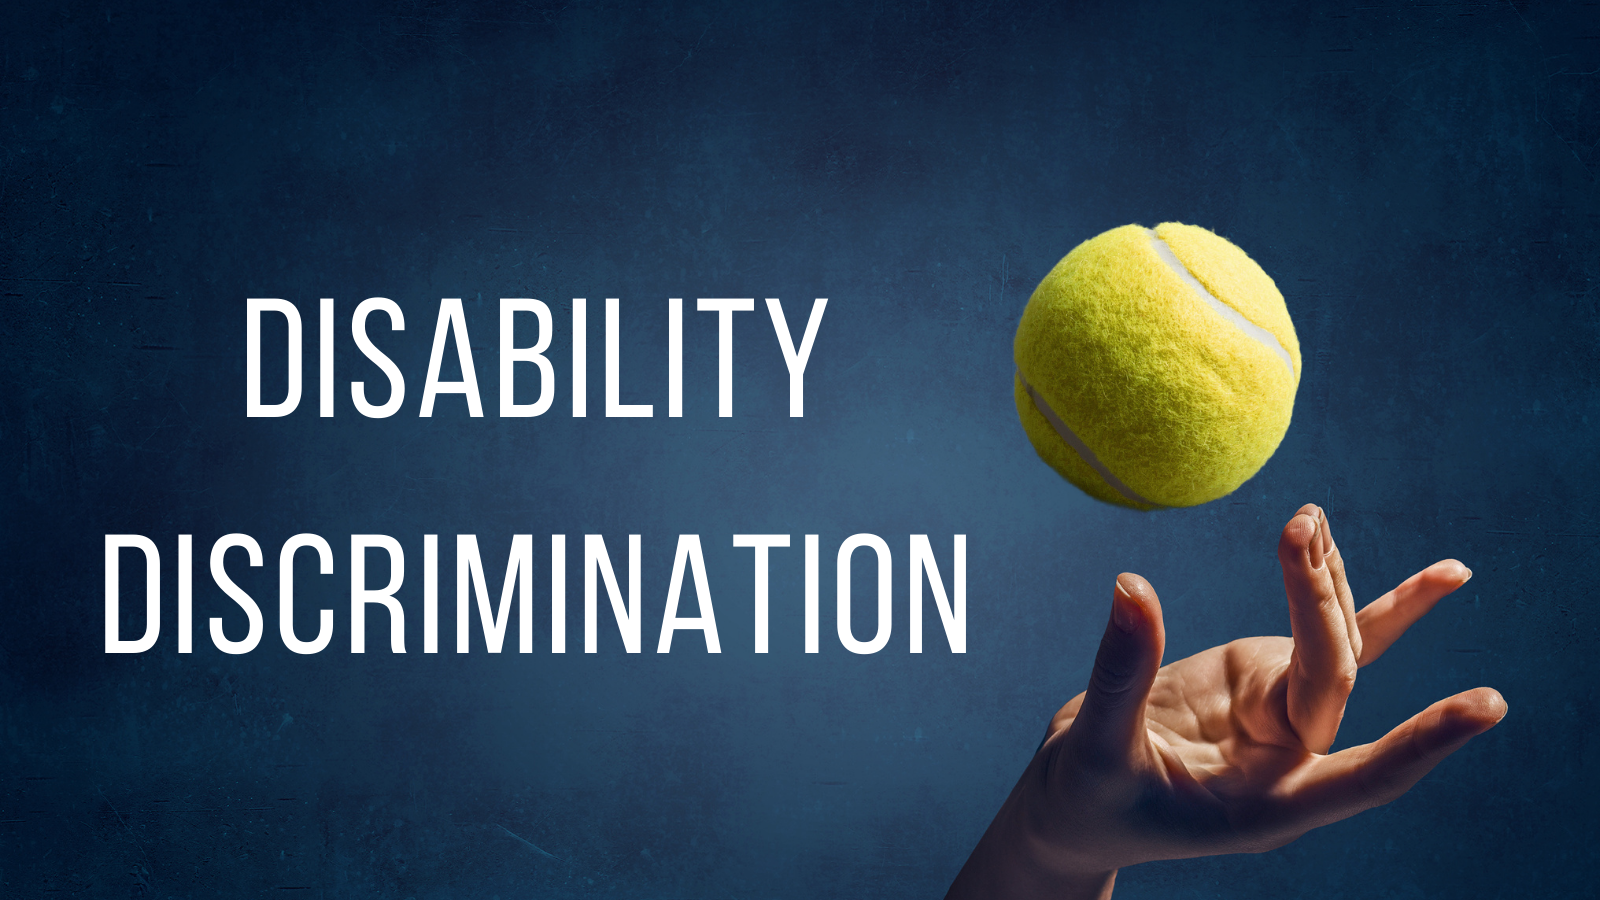 Naomi Osaka – The case of Disability Discrimination